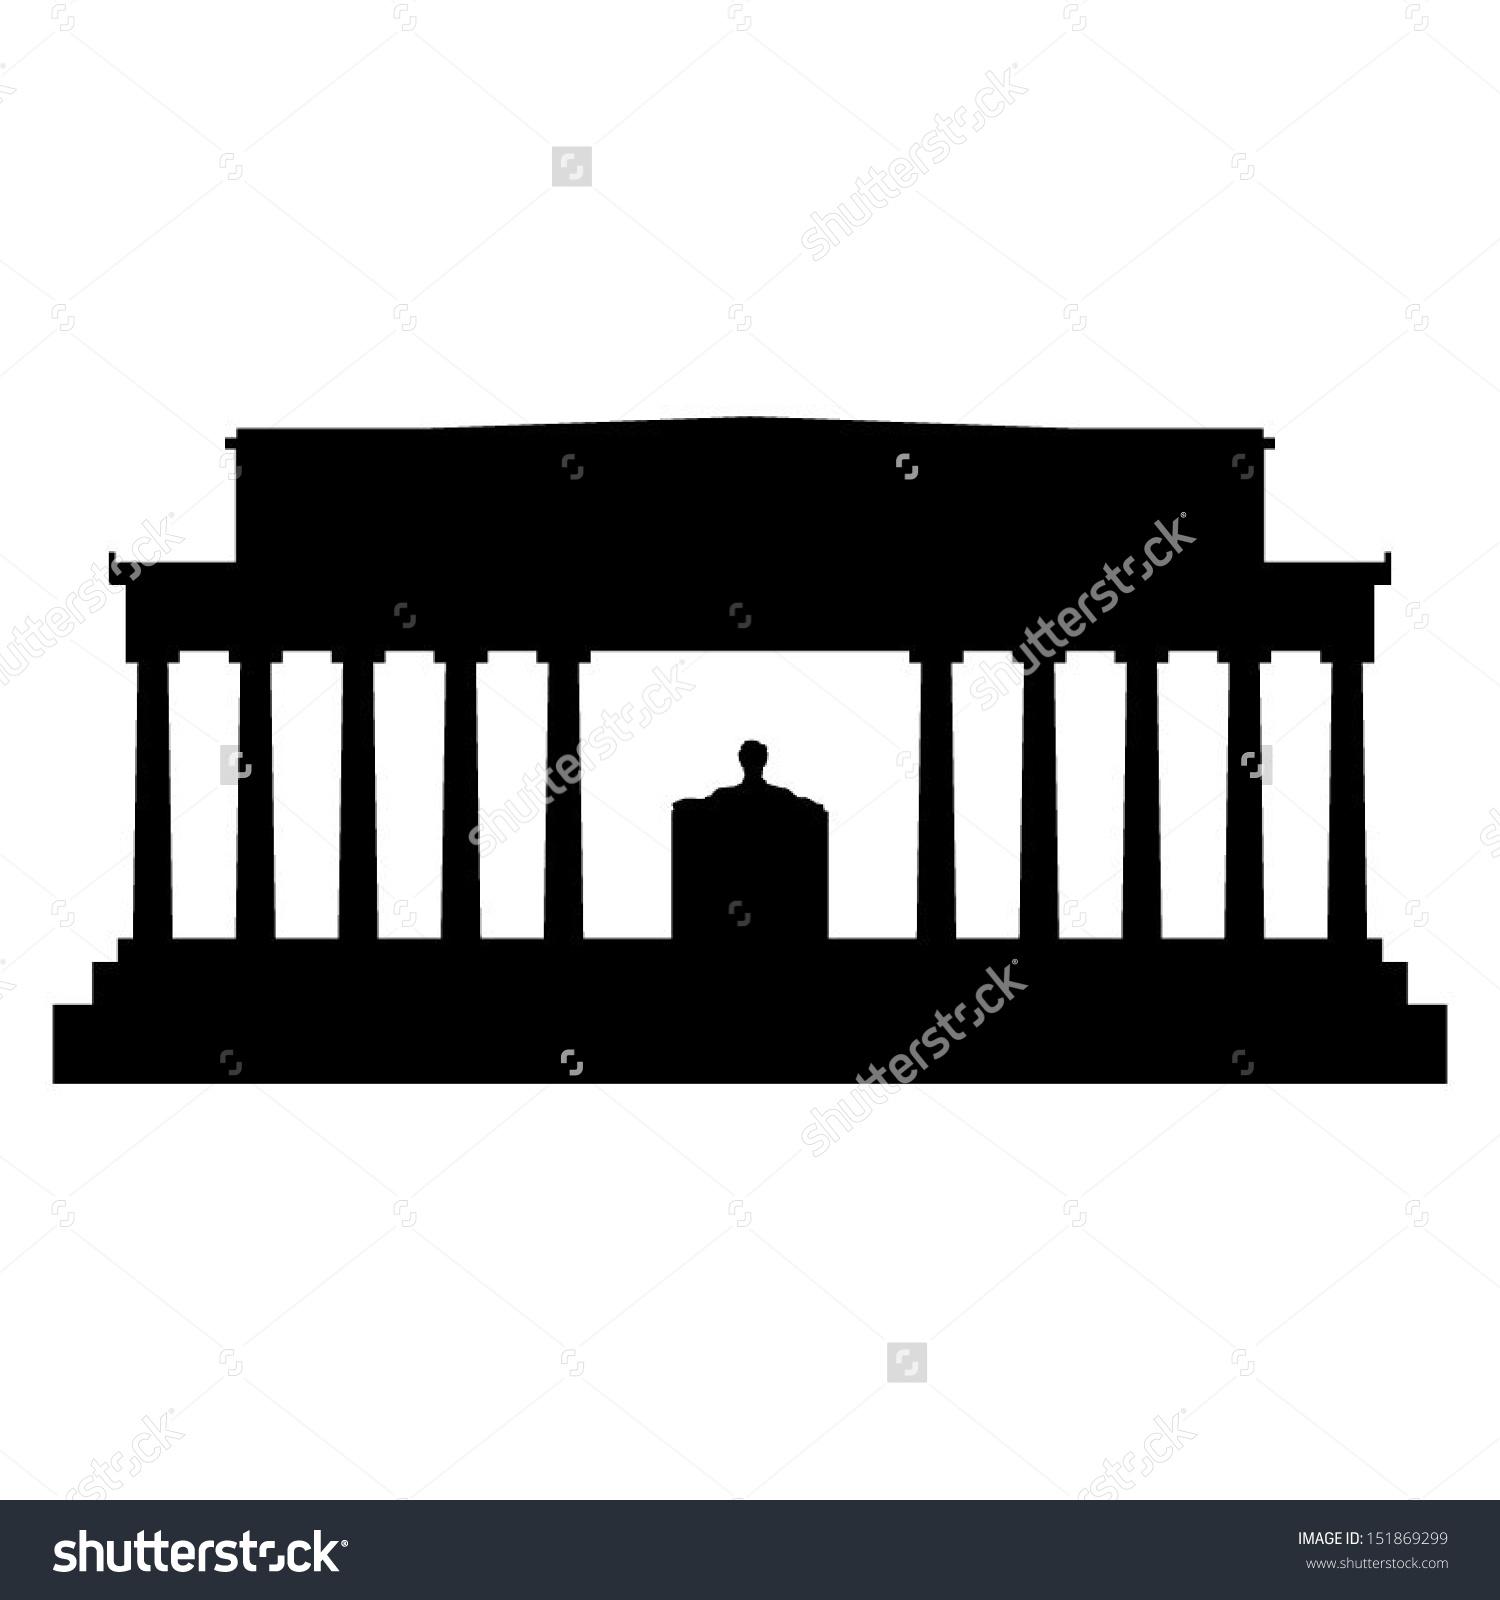 Lincoln memorial building clipart.